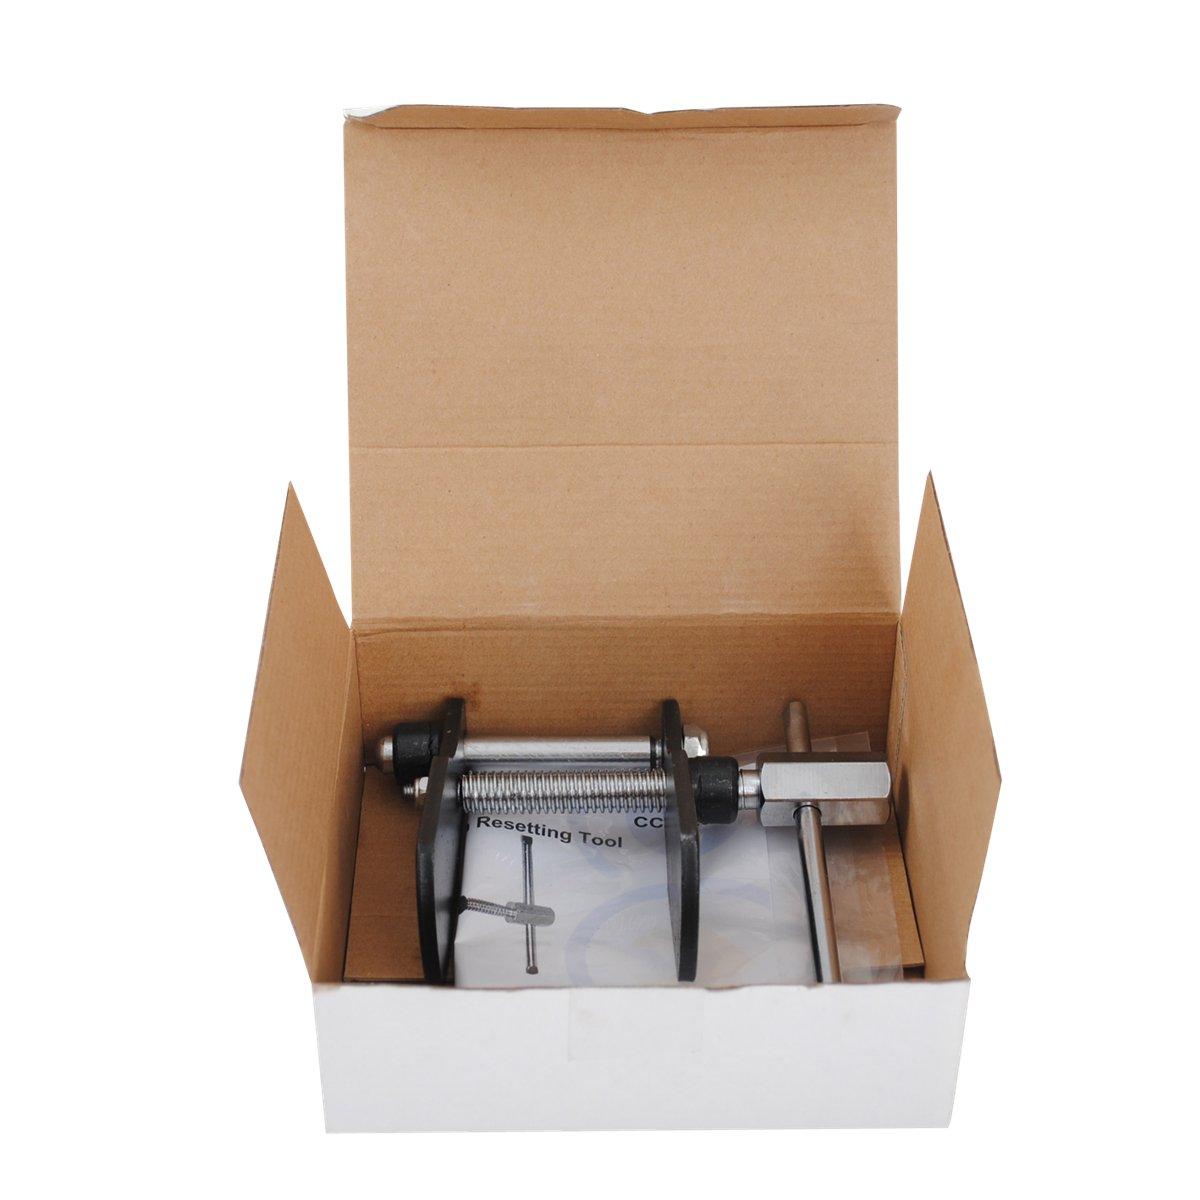 CCLIFE Universal Bremskolbenrücksteller Satz Bremskolben Rücksteller Werkzeug für Bremskolben ohne Drehvorrichtung